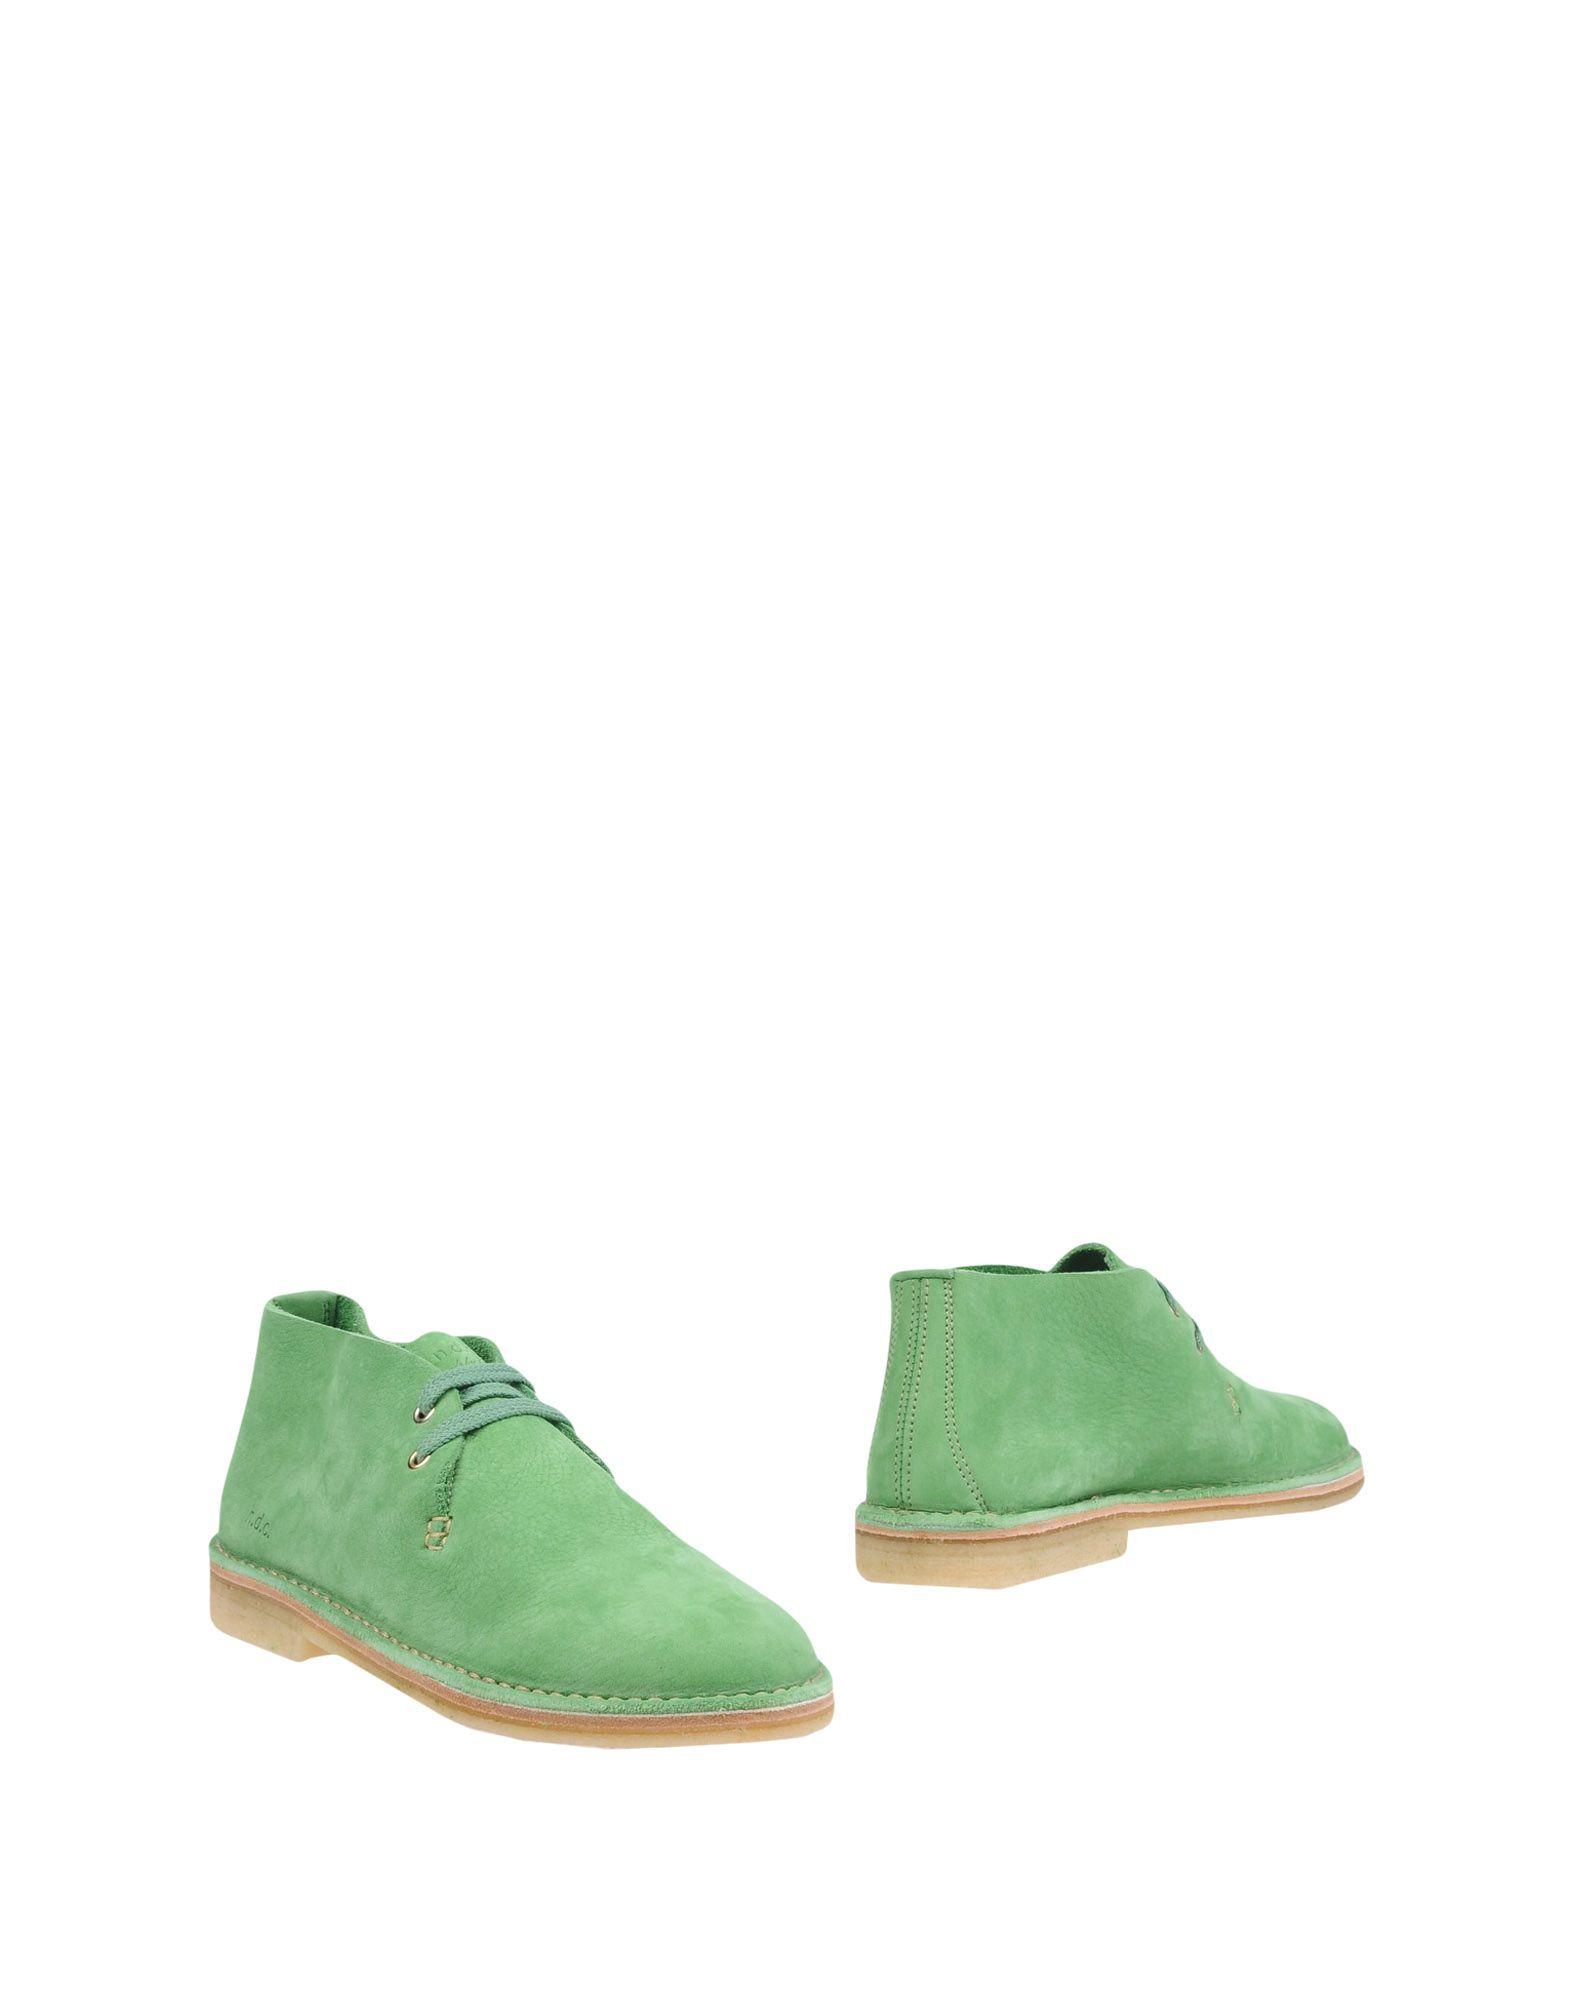 PERE by N.D.C. Полусапоги и высокие ботинки si by sinela полусапоги и высокие ботинки